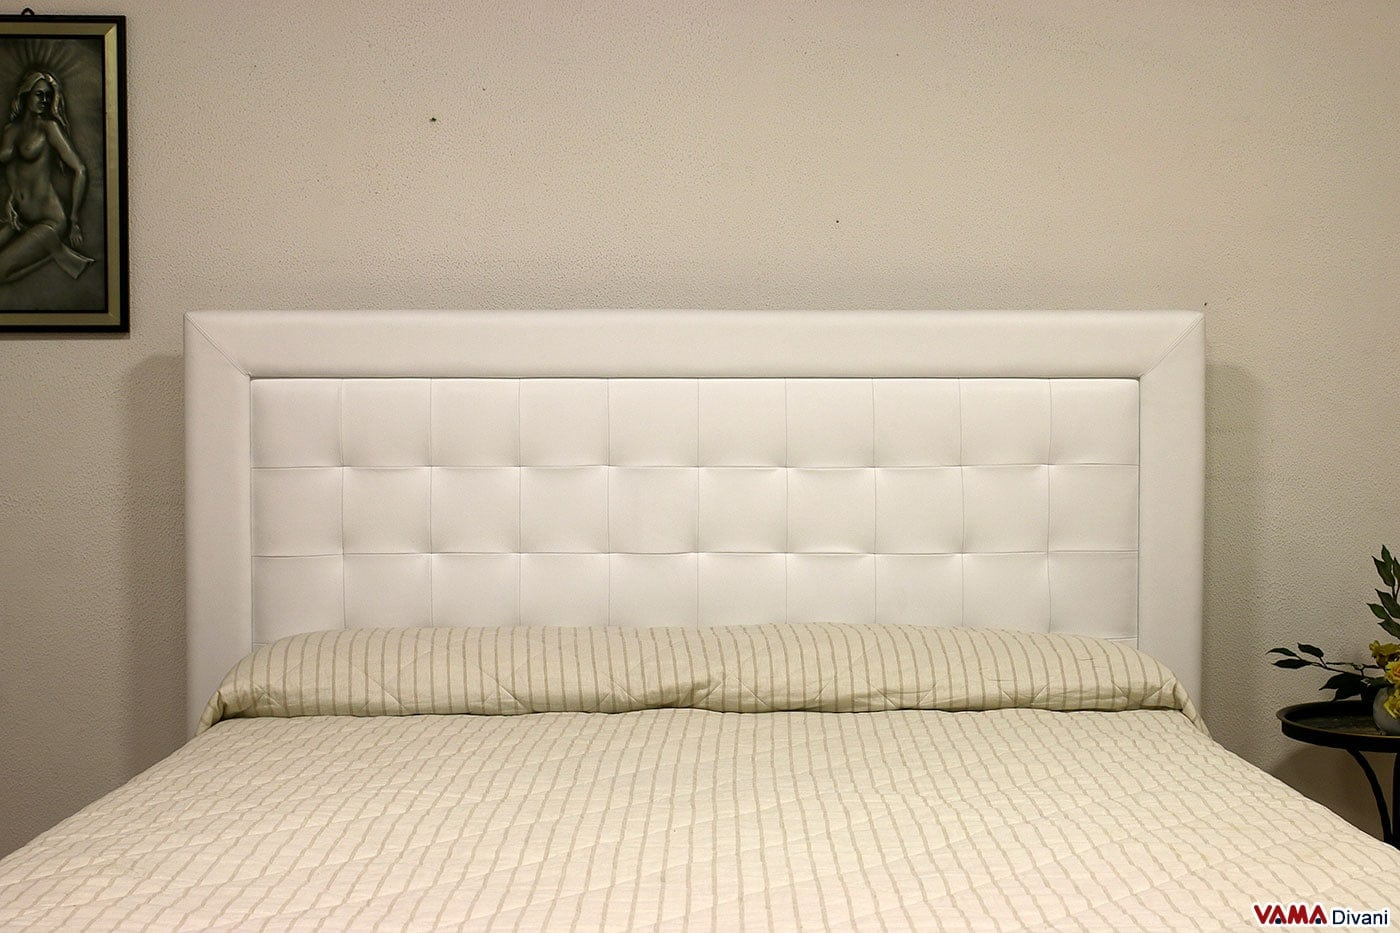 Letto moderno in pelle luisa vama divani - Imbottitura testata letto ...